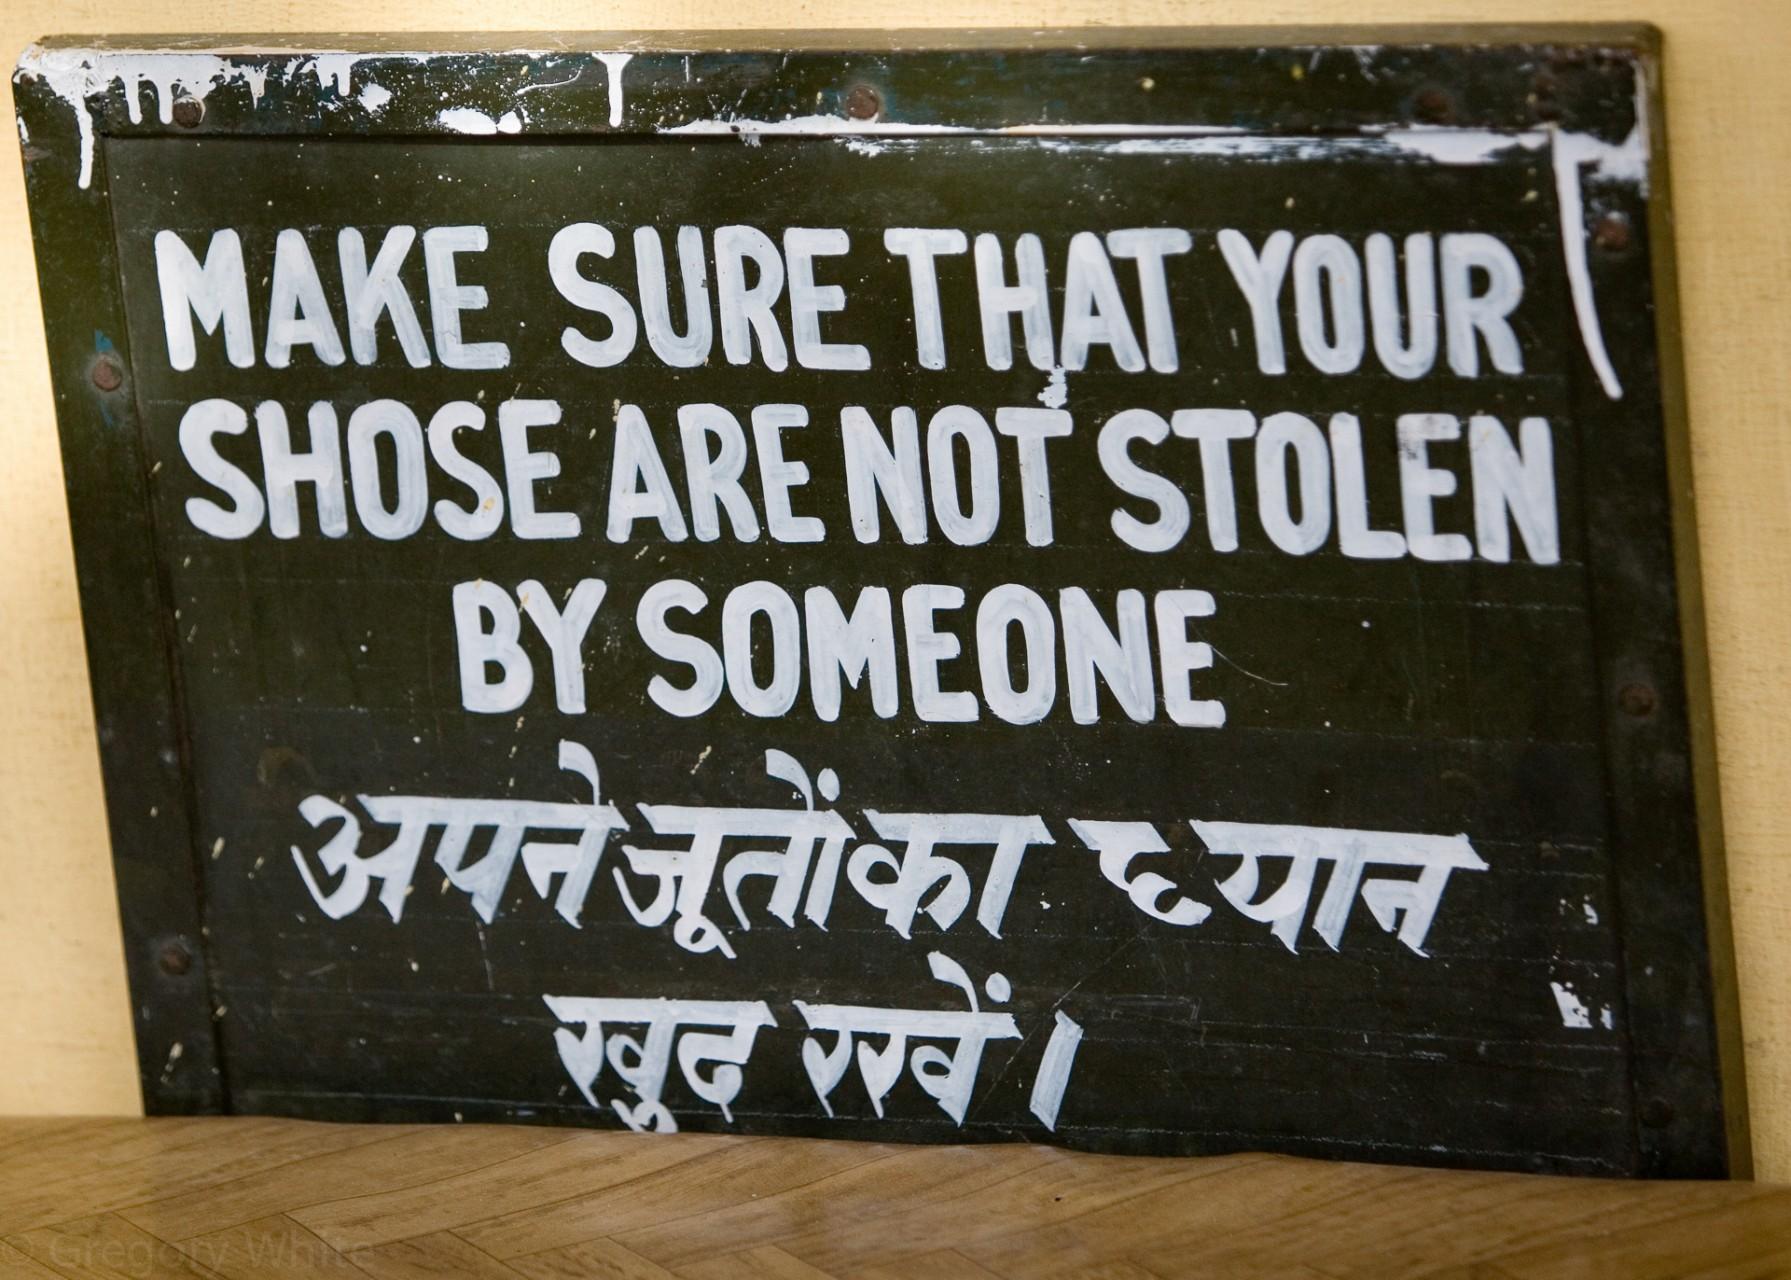 Make sure your shose are not stolen.